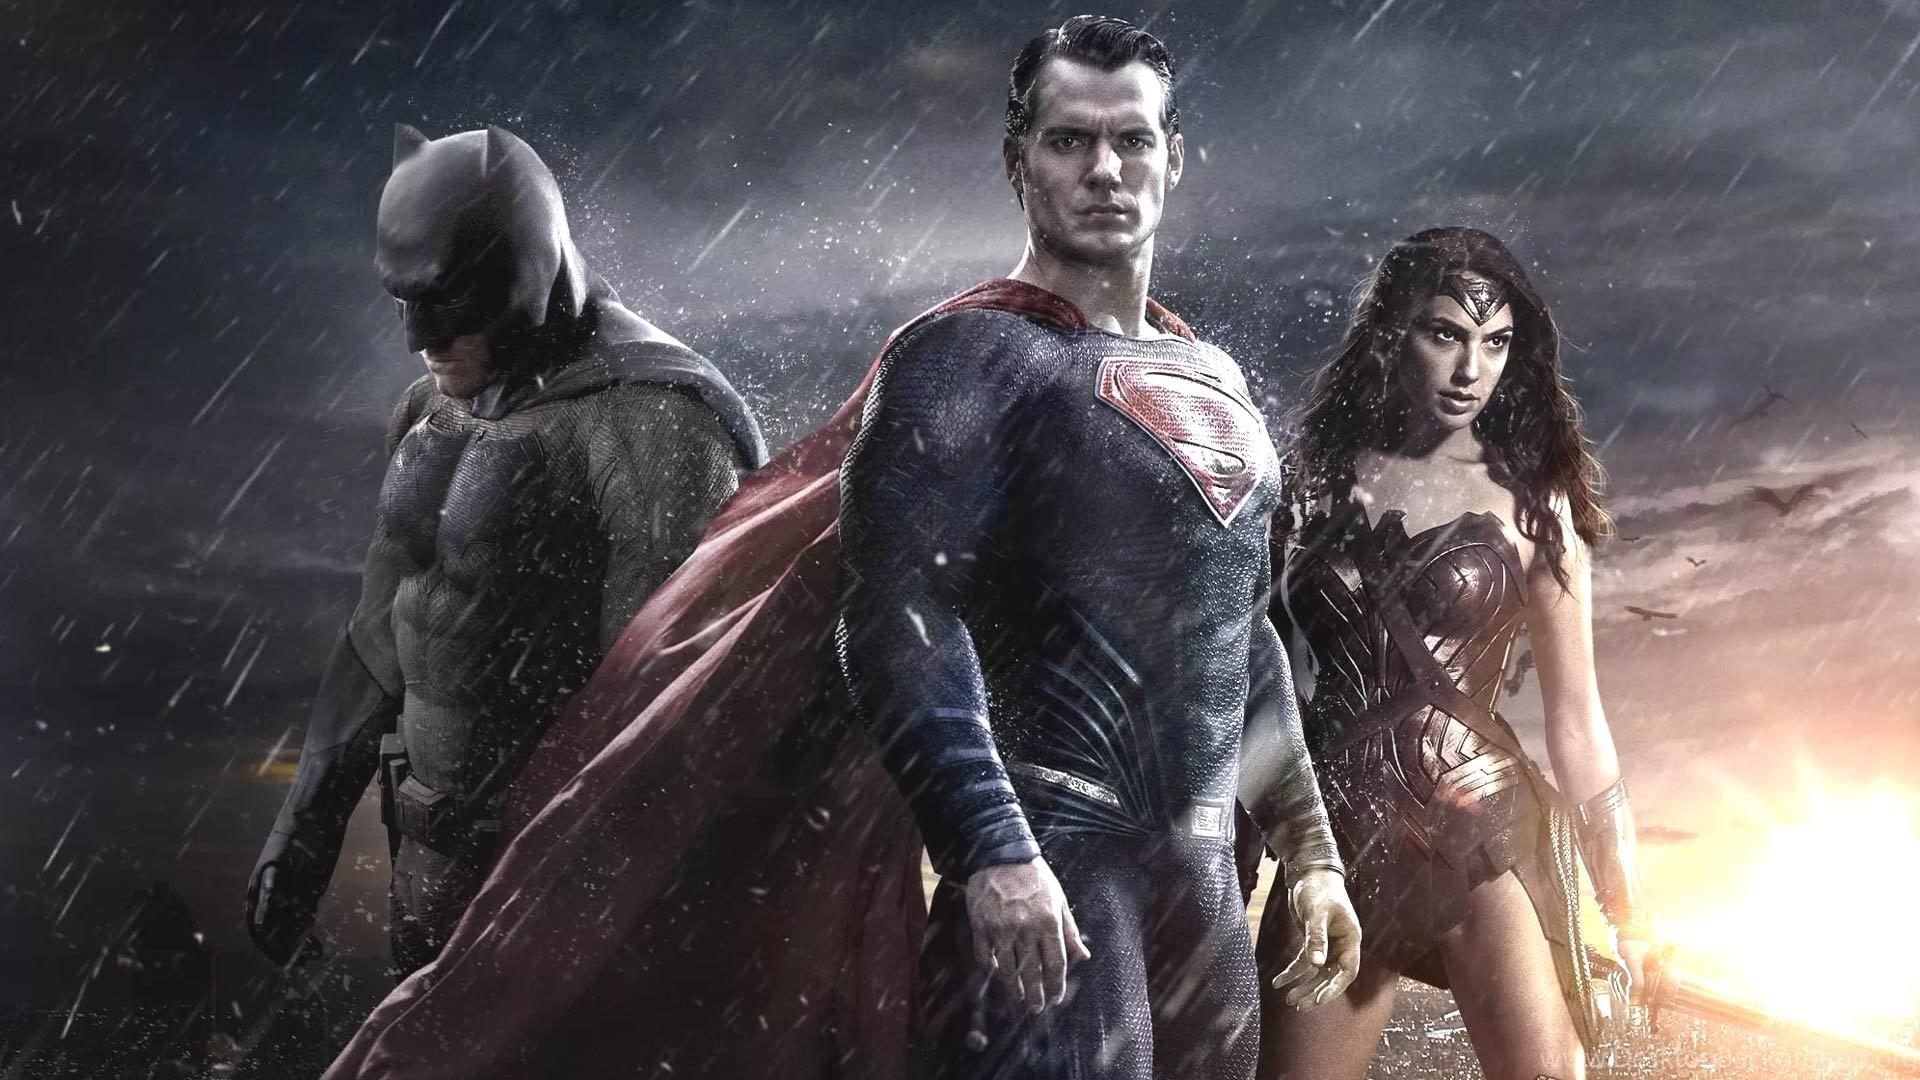 Batman Vs Superman Dawn Of Justice Wallpapers Hd 1080p For Desktop